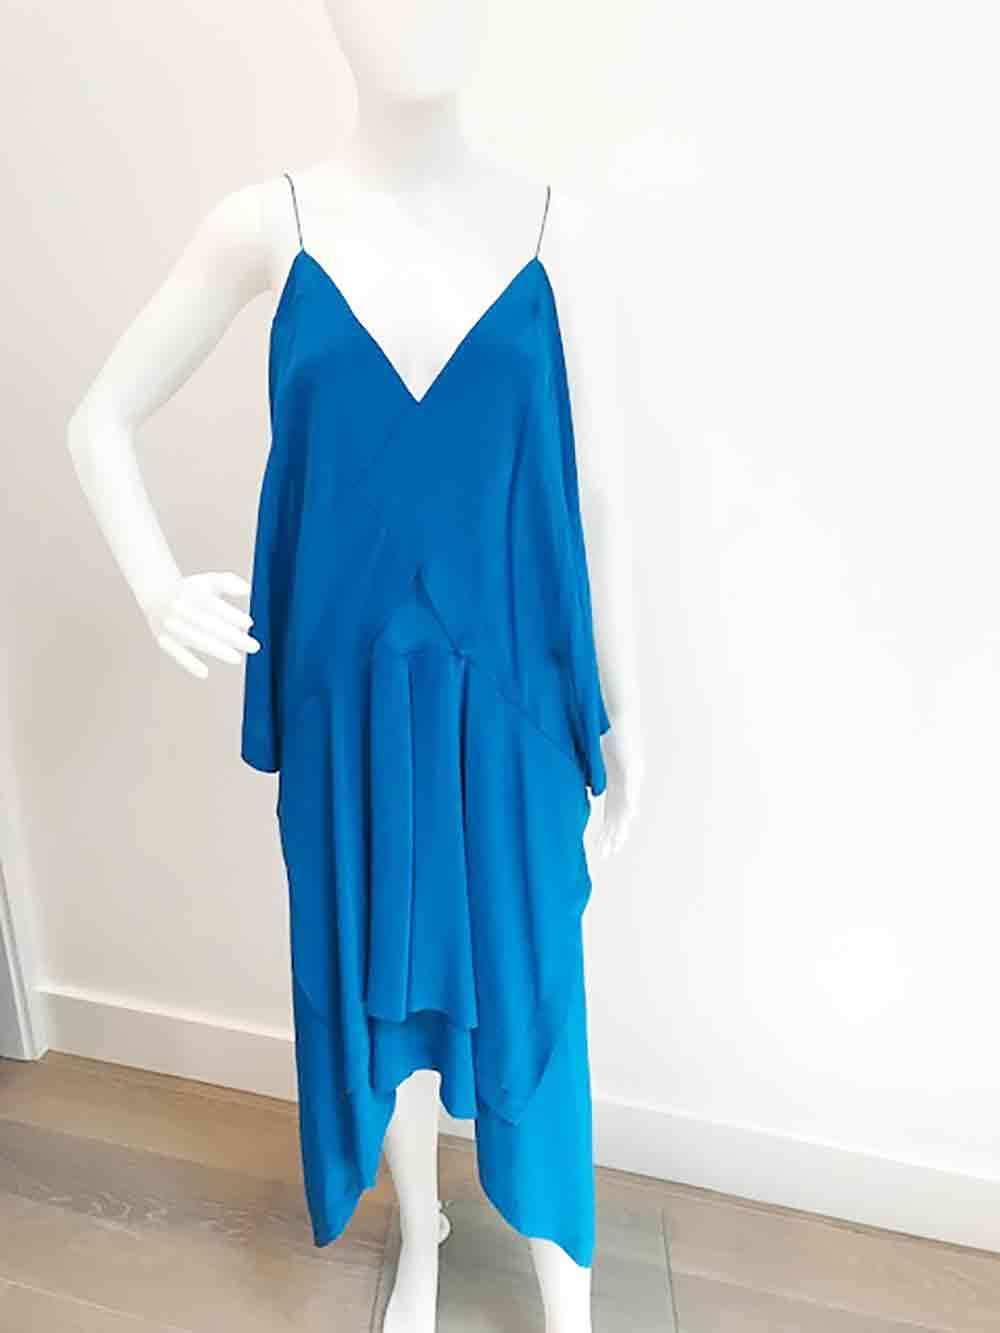 Designer BNWOT KITX By Kit Willow Stunning Vivid bluee Silk Size 6 Women's Dress